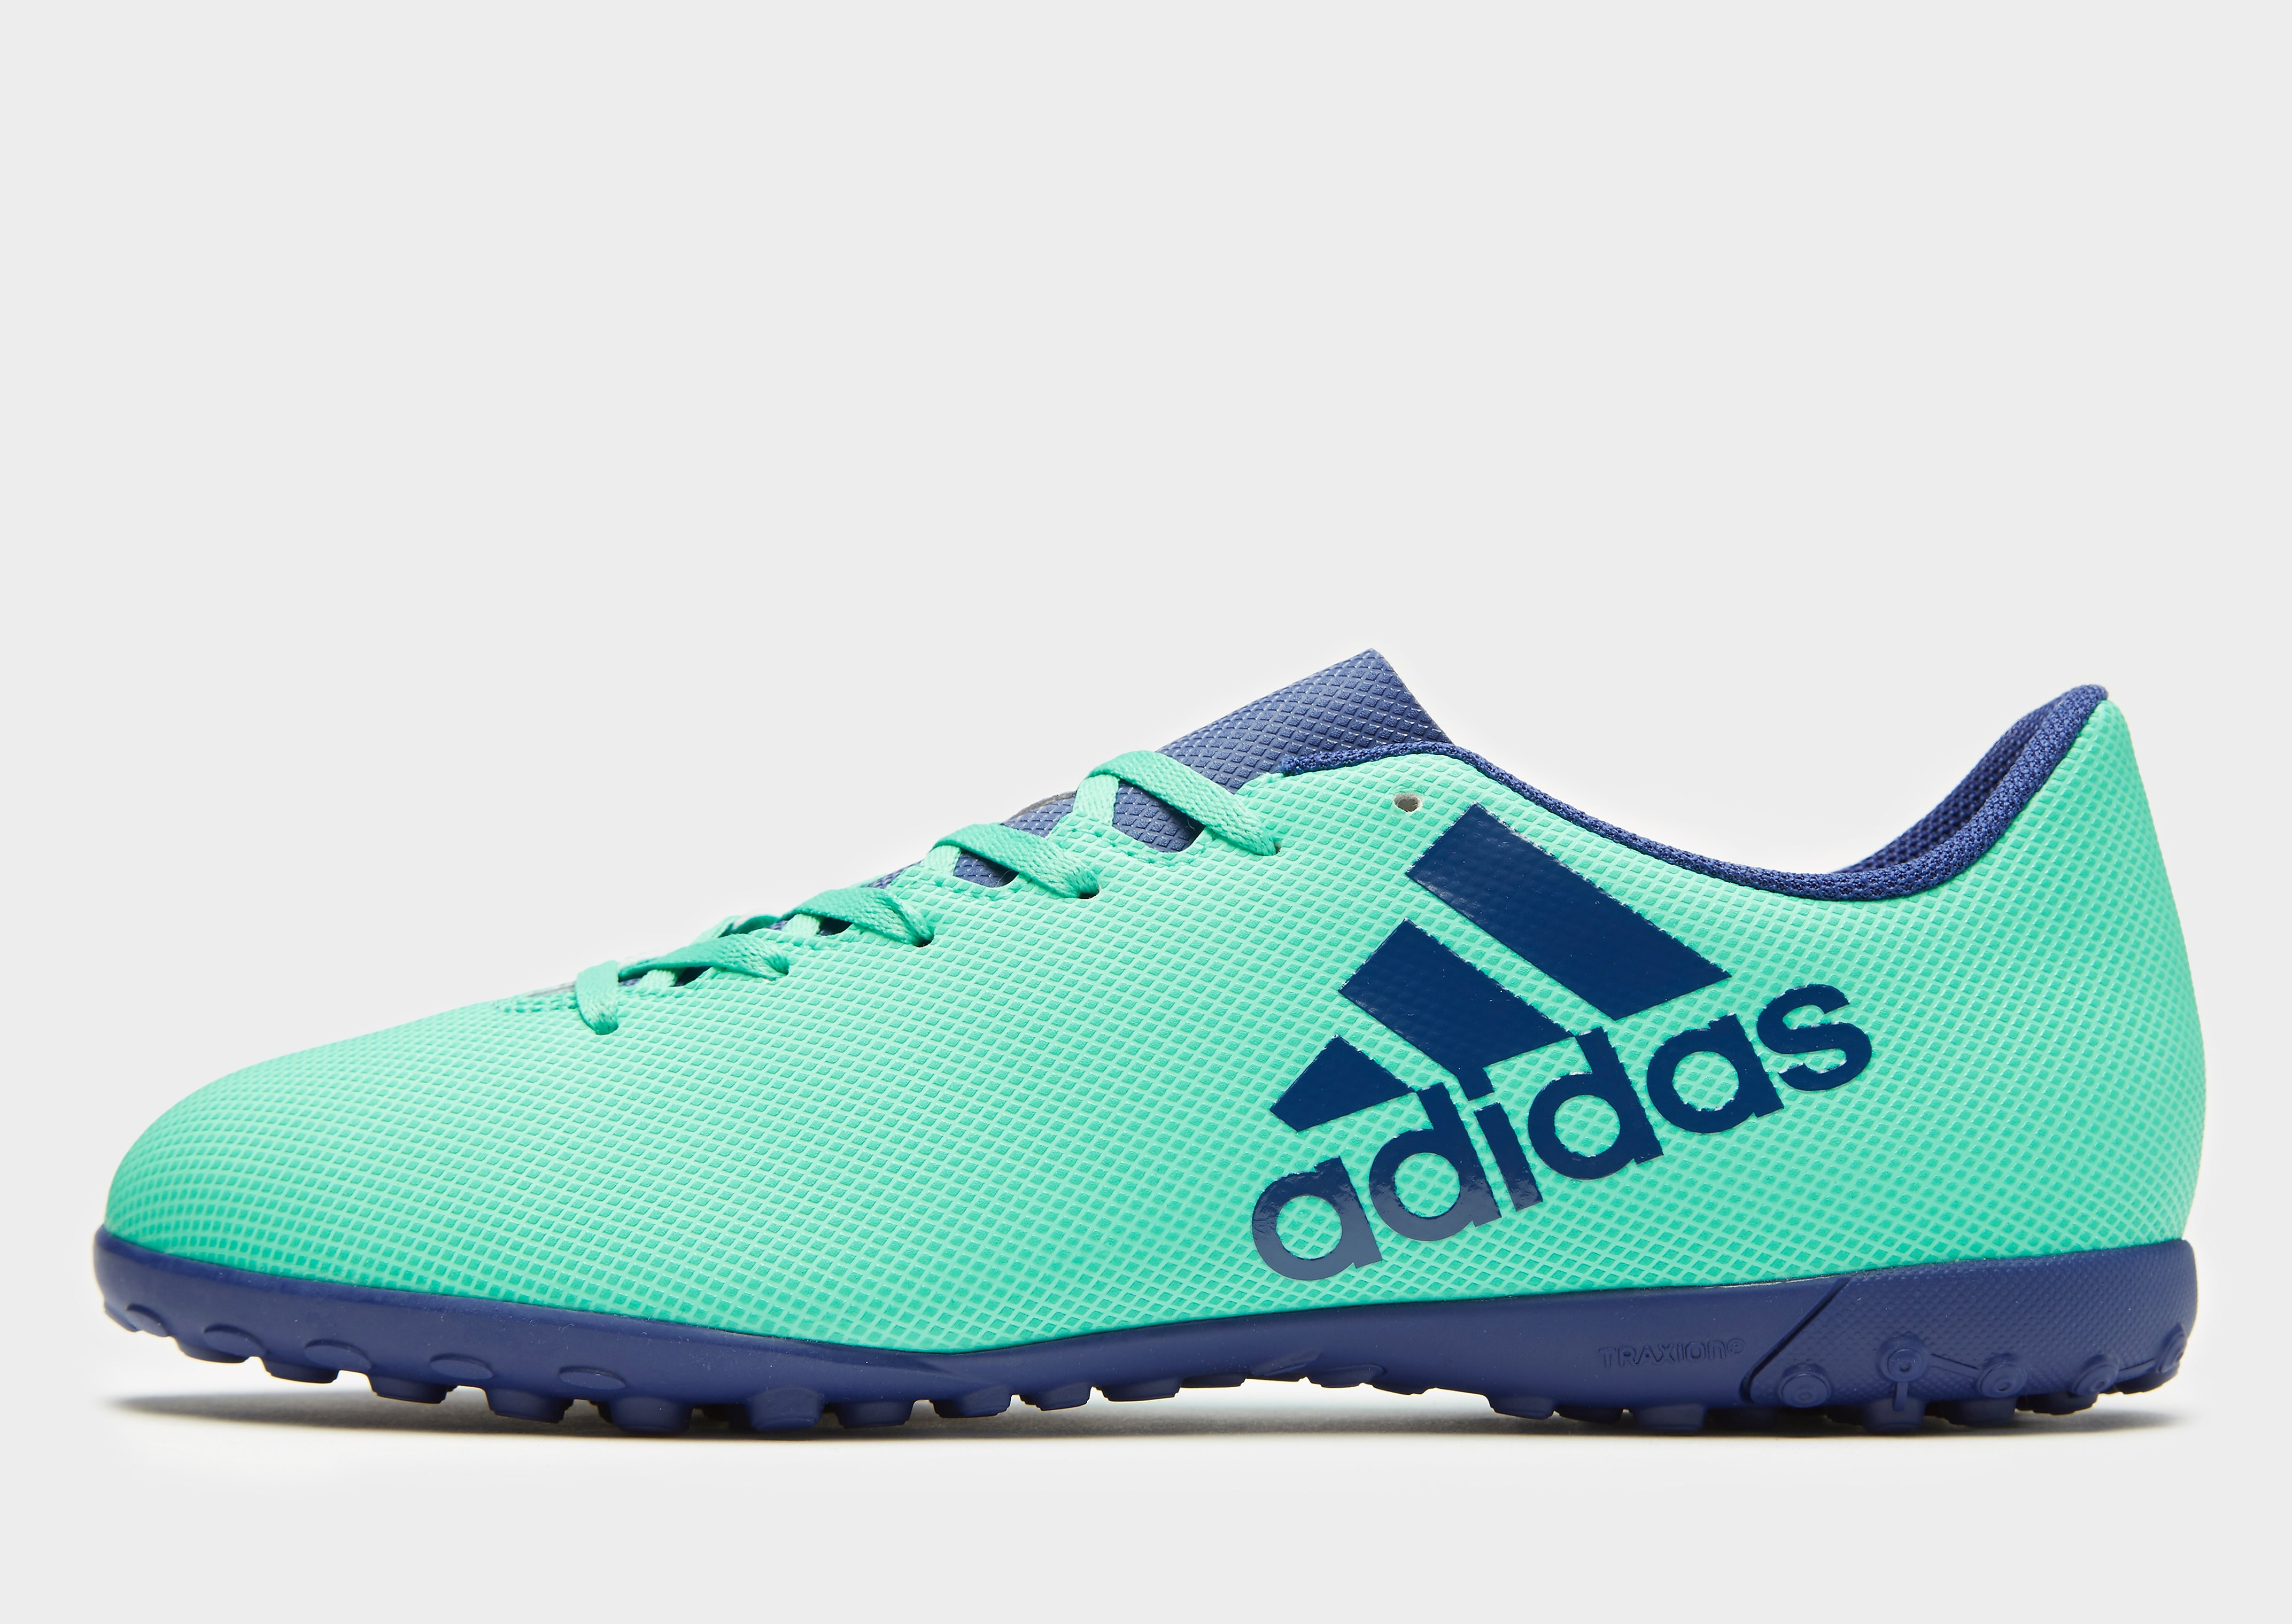 adidas Deadly Strike X 17.4 TF PRE ORDER